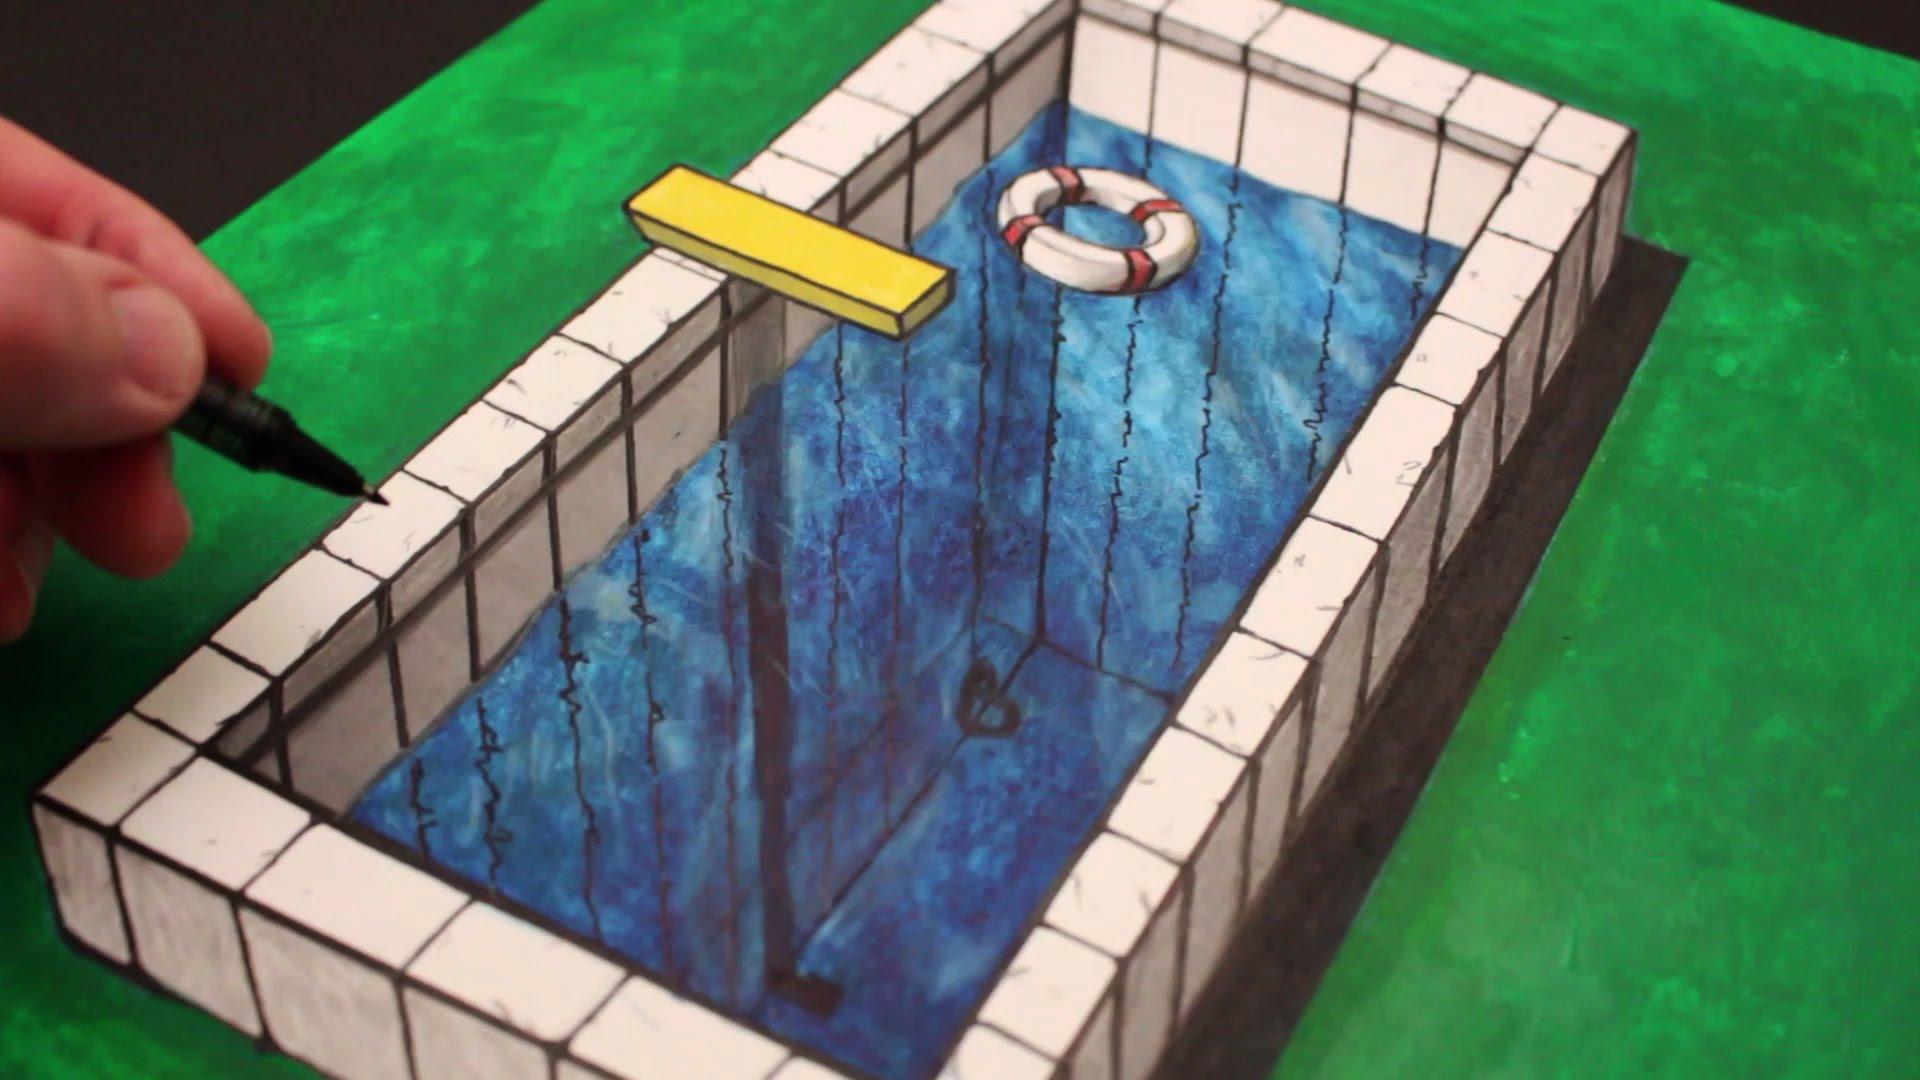 Drawn optical illusion swimming pool Anamorphic How Pool Draw a